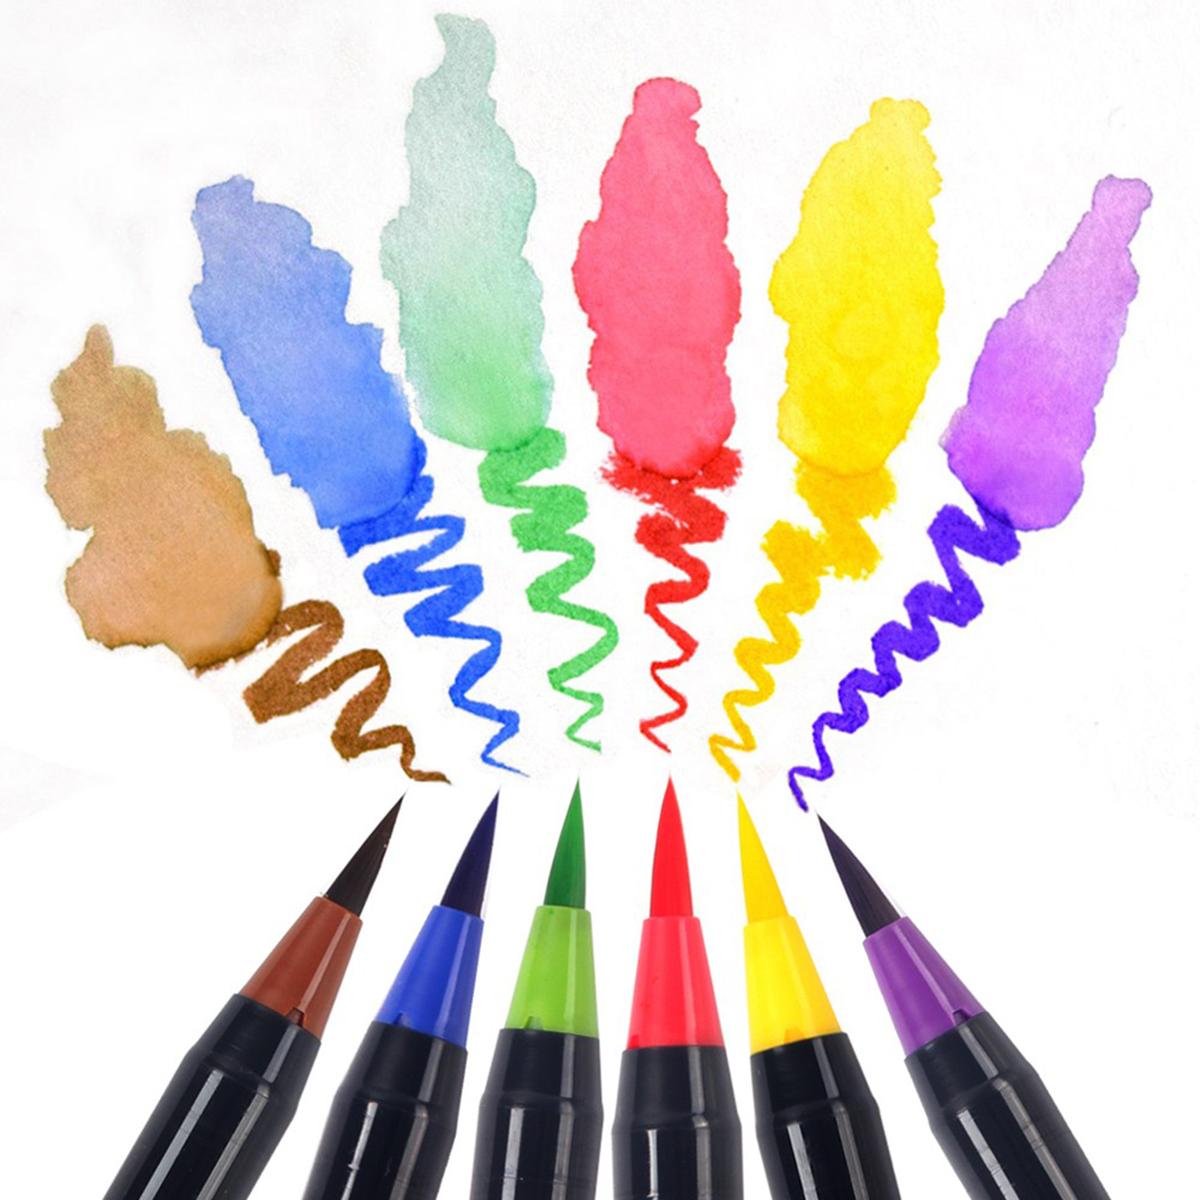 20 Colors Watercolor Drawing Writing Brush Artist Sketch ...